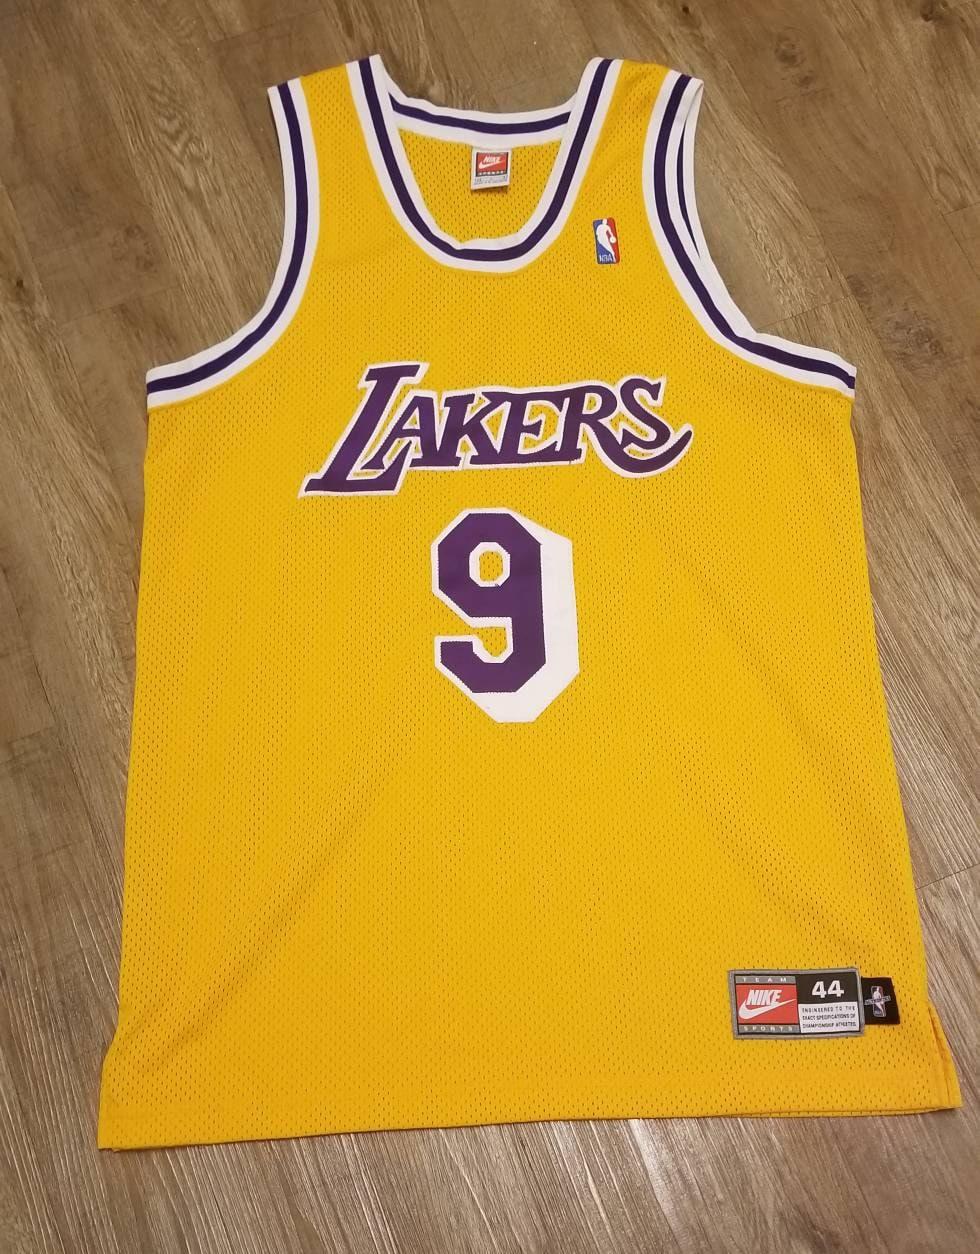 555dffded 1997-98 Nick van exel jersey nike jerseylakers jersey Nike